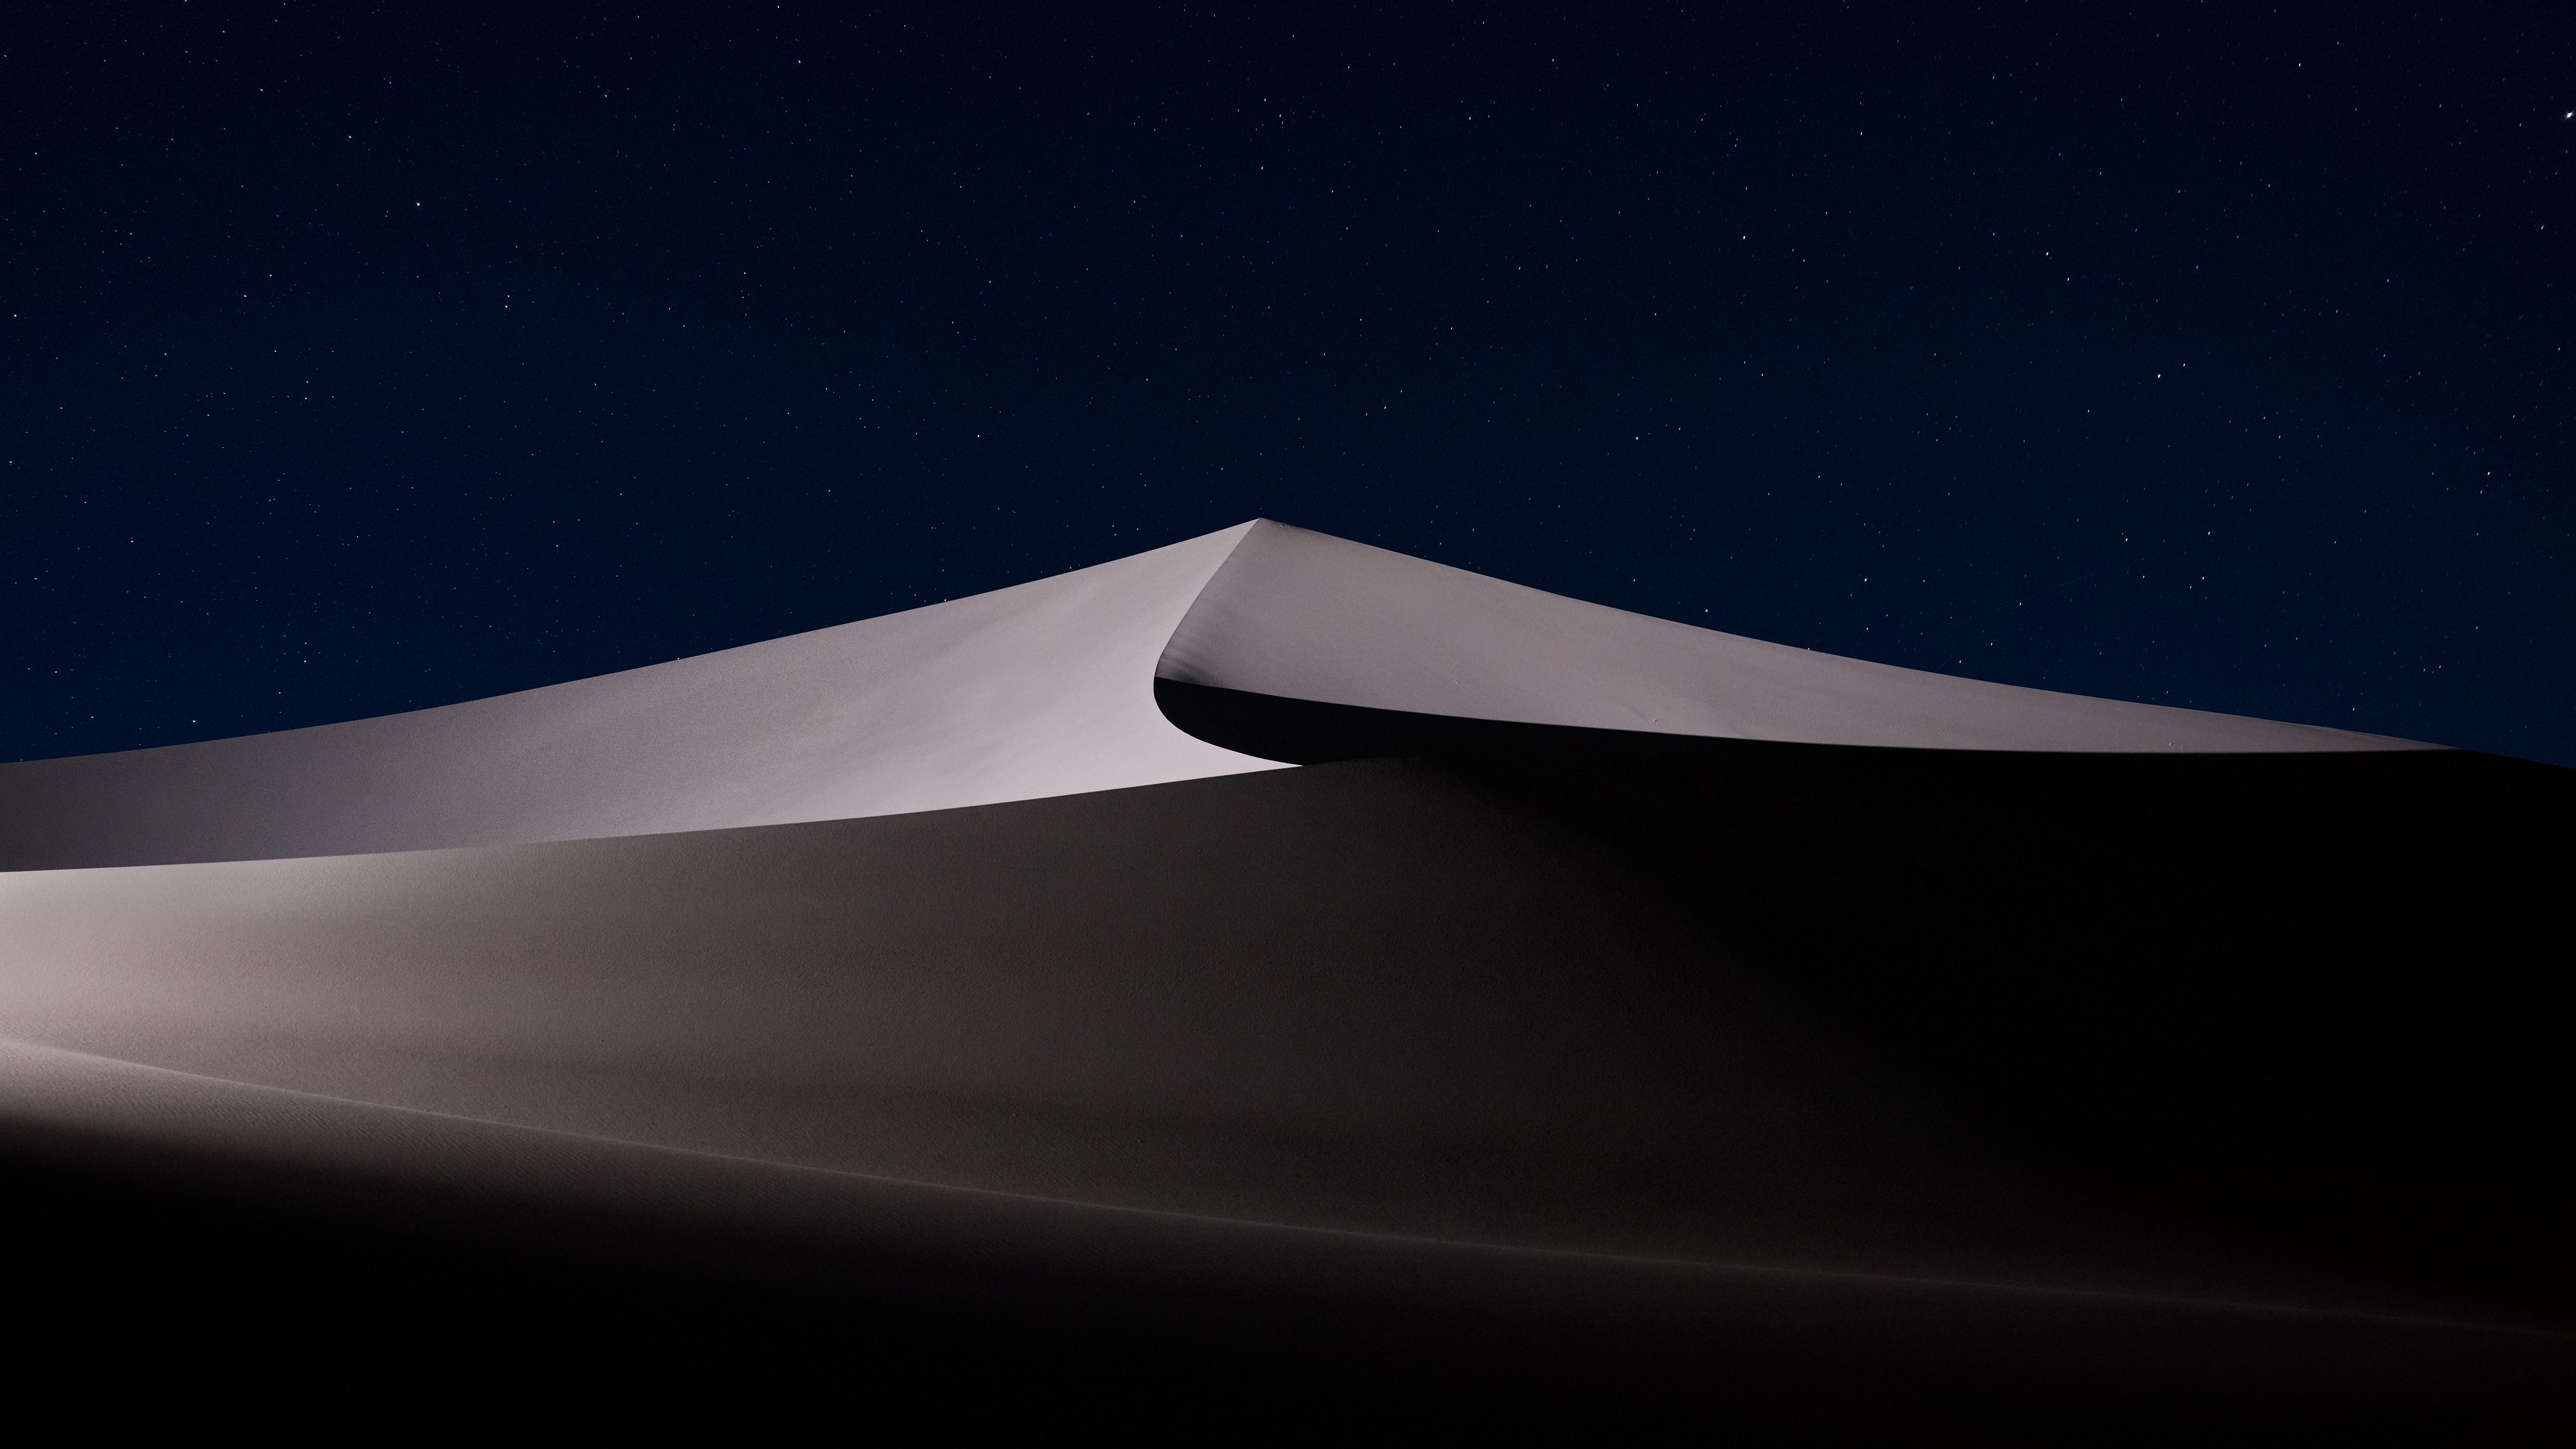 Wallpaper Mac Os X Mojave Nature Lamdscape Desert